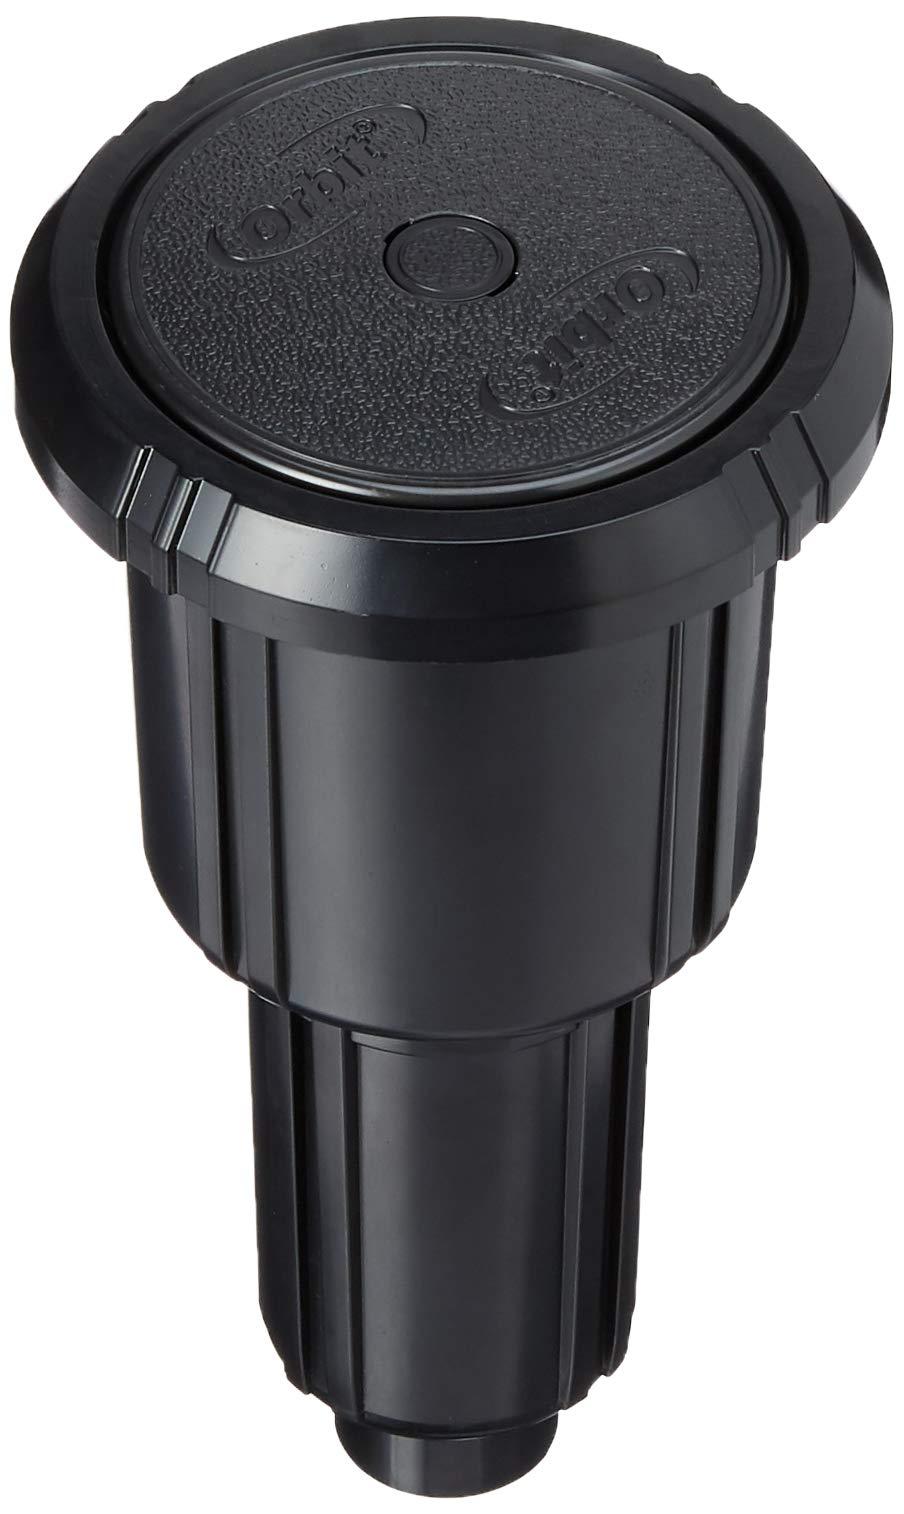 Orbit 55201 Sprinkler Adjustable Pattern